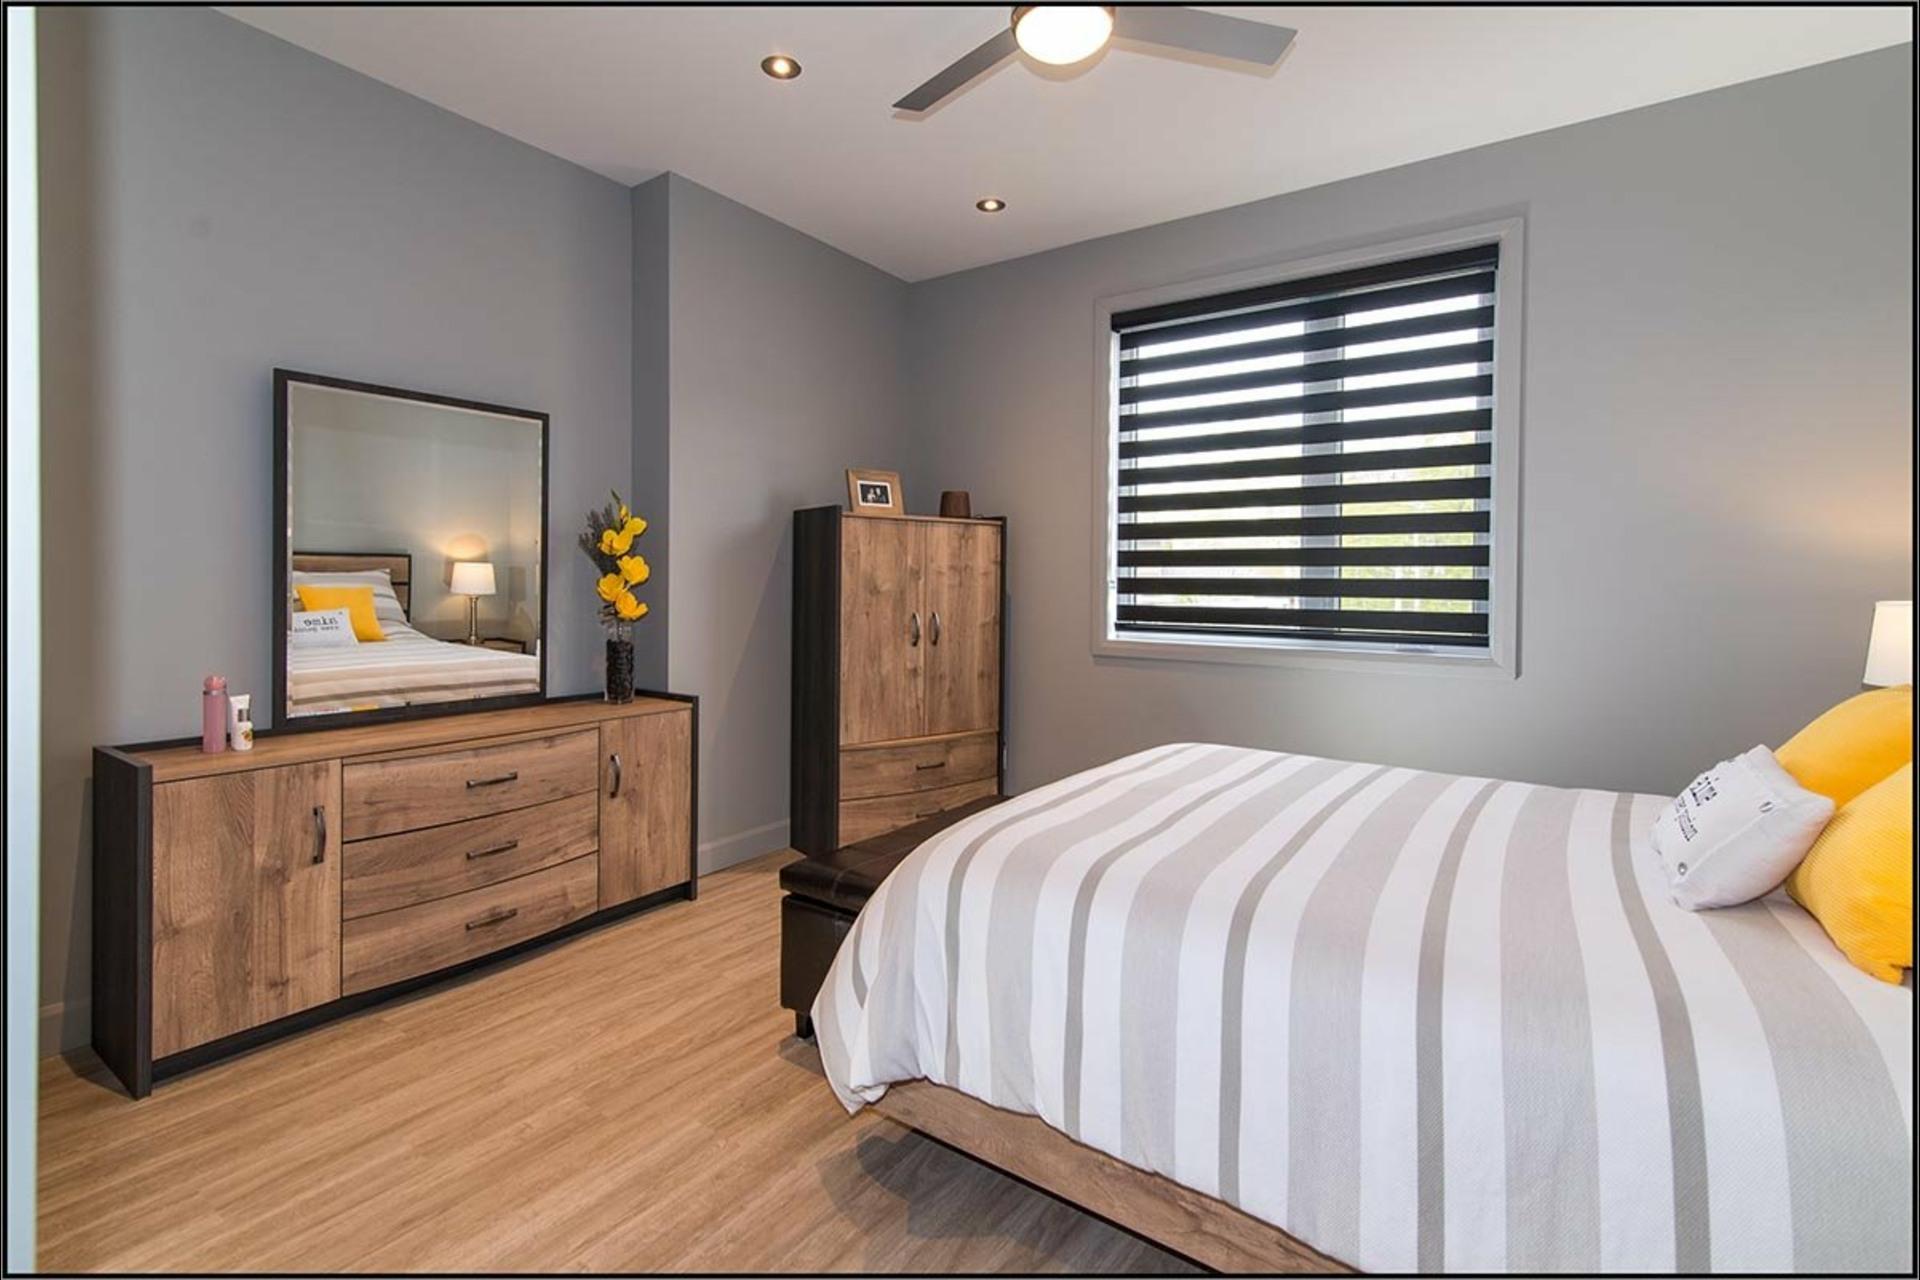 image 7 - Apartment For sale Sainte-Marie - 9 rooms